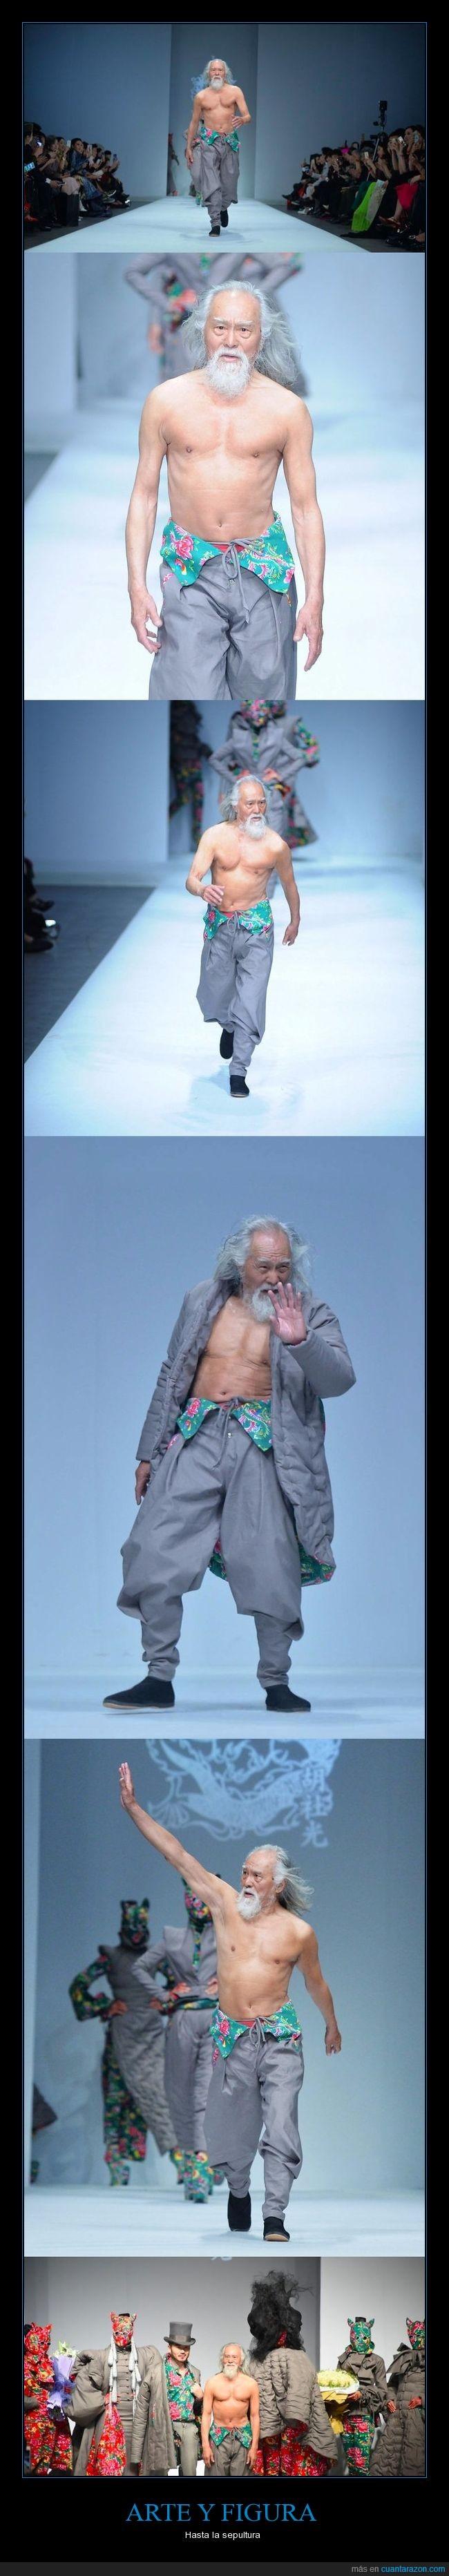 80 años,abuelo,desfilar,modelo